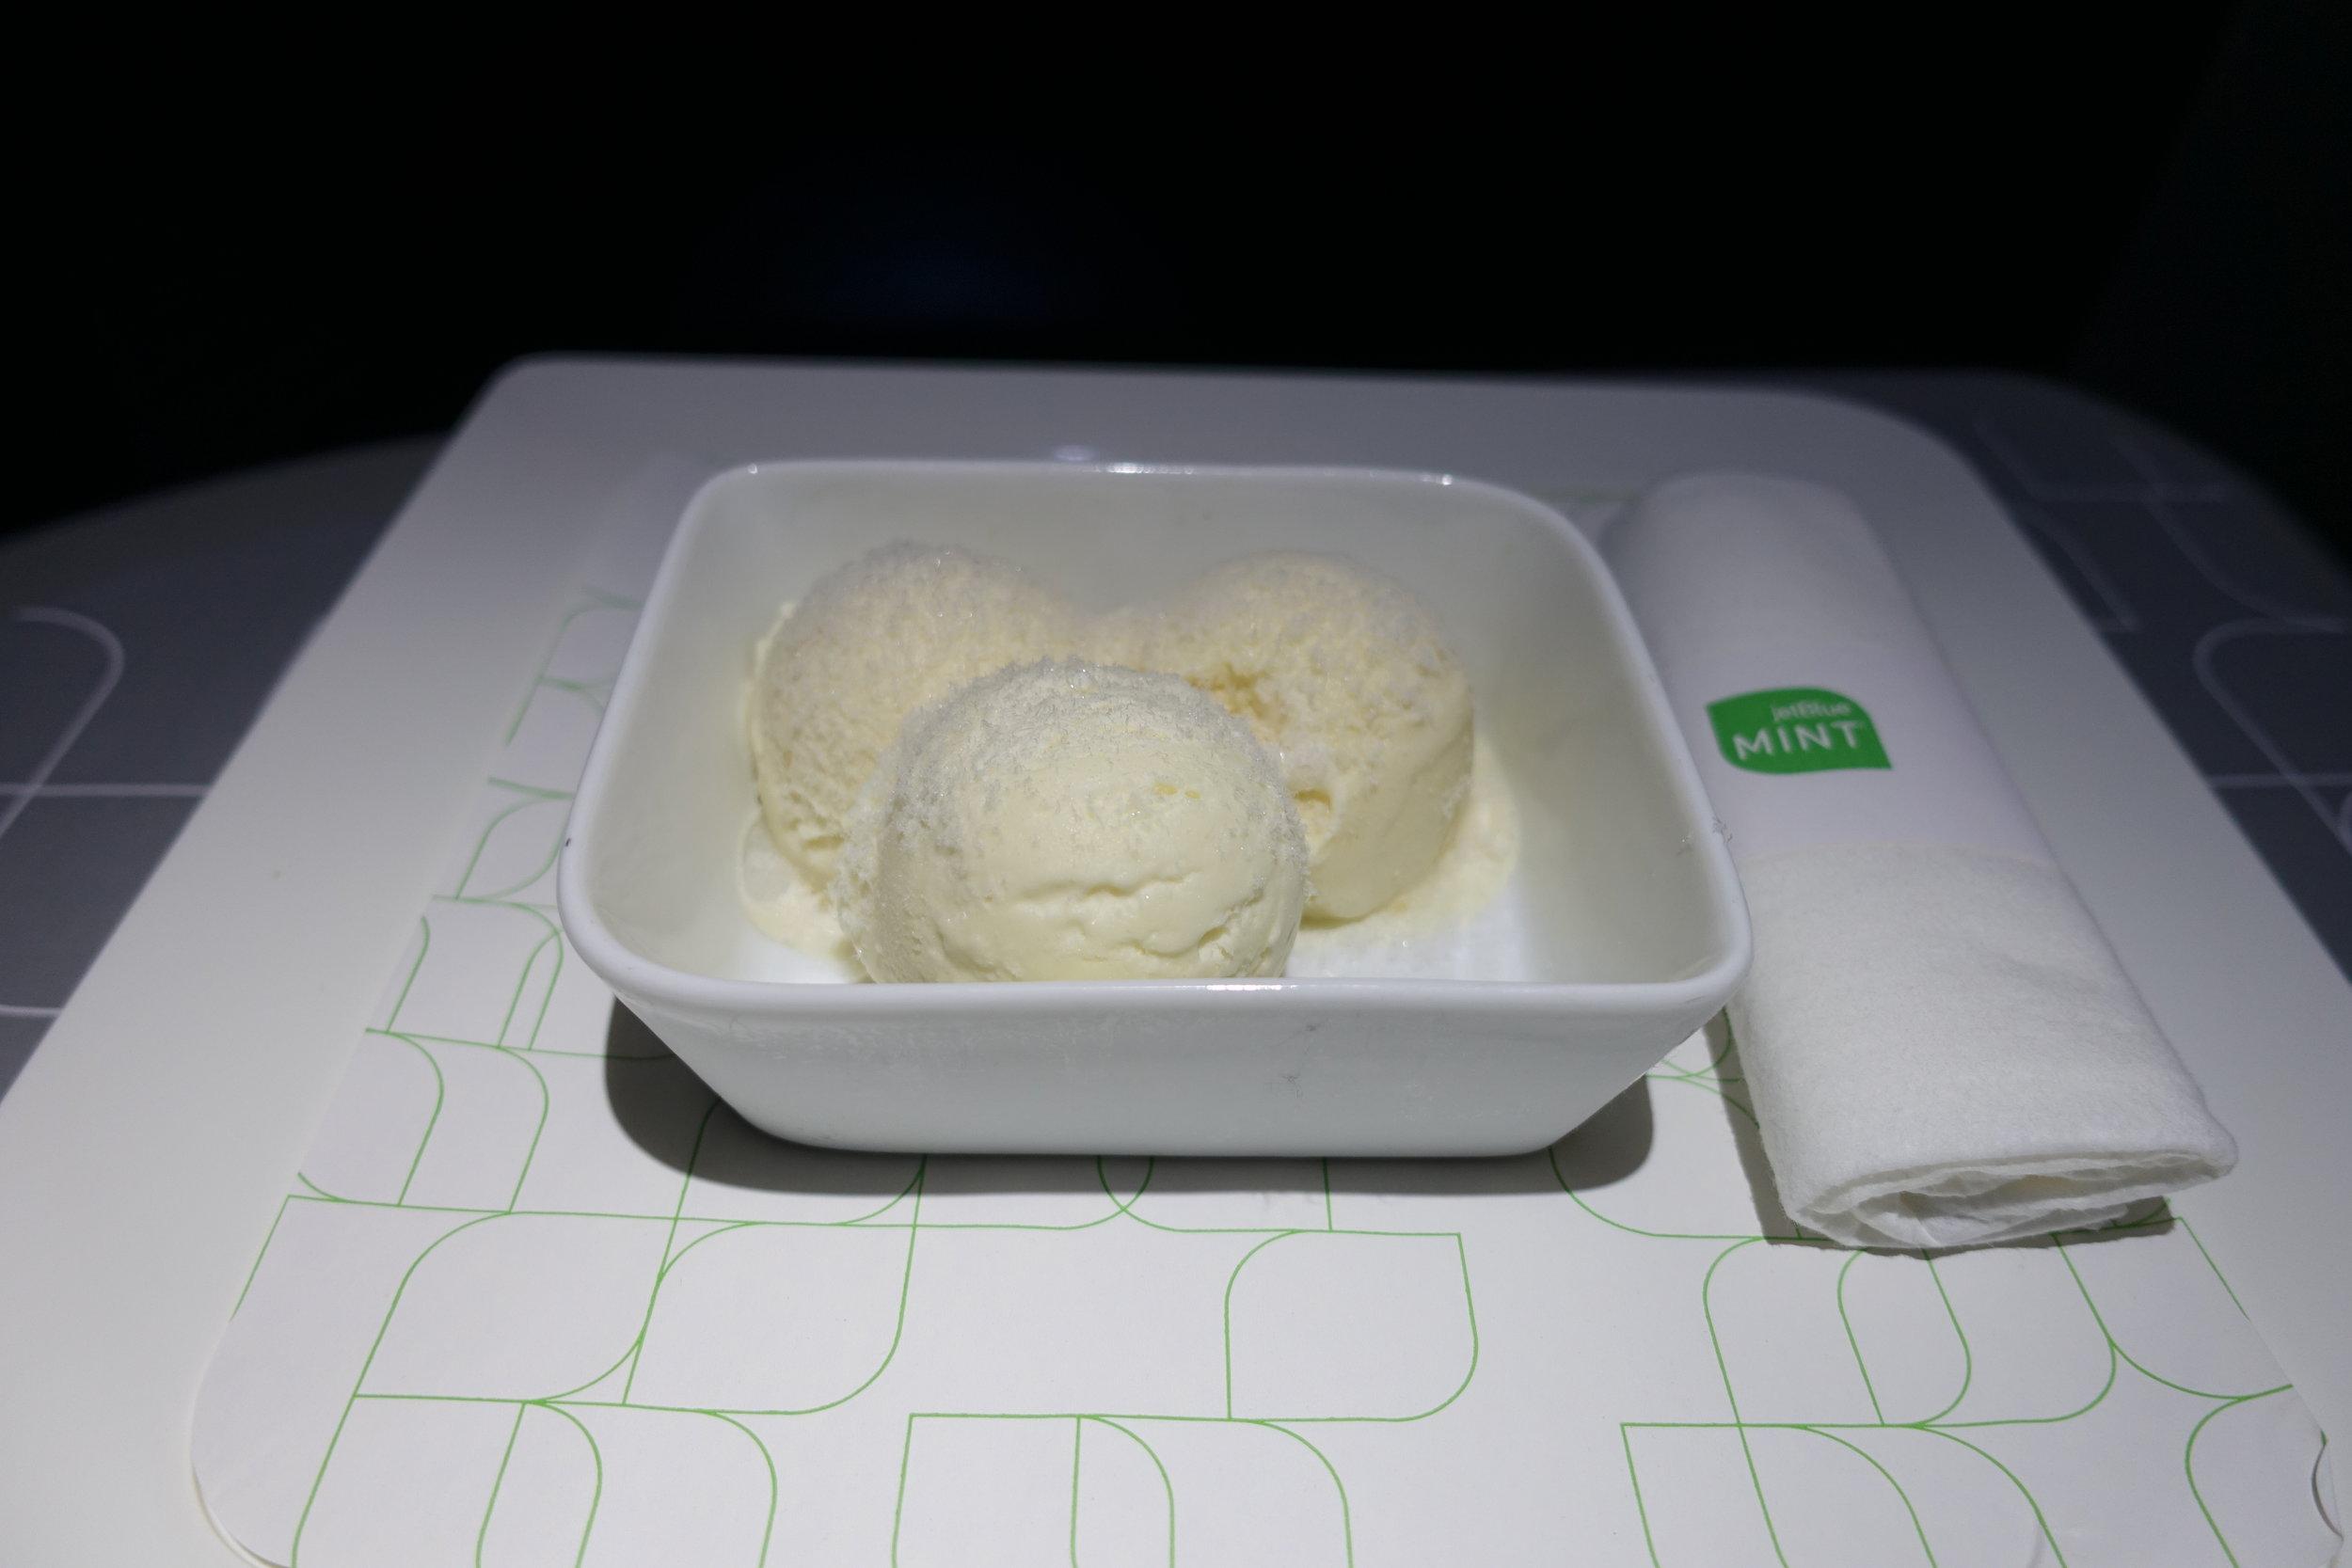 JetBlue ice cream